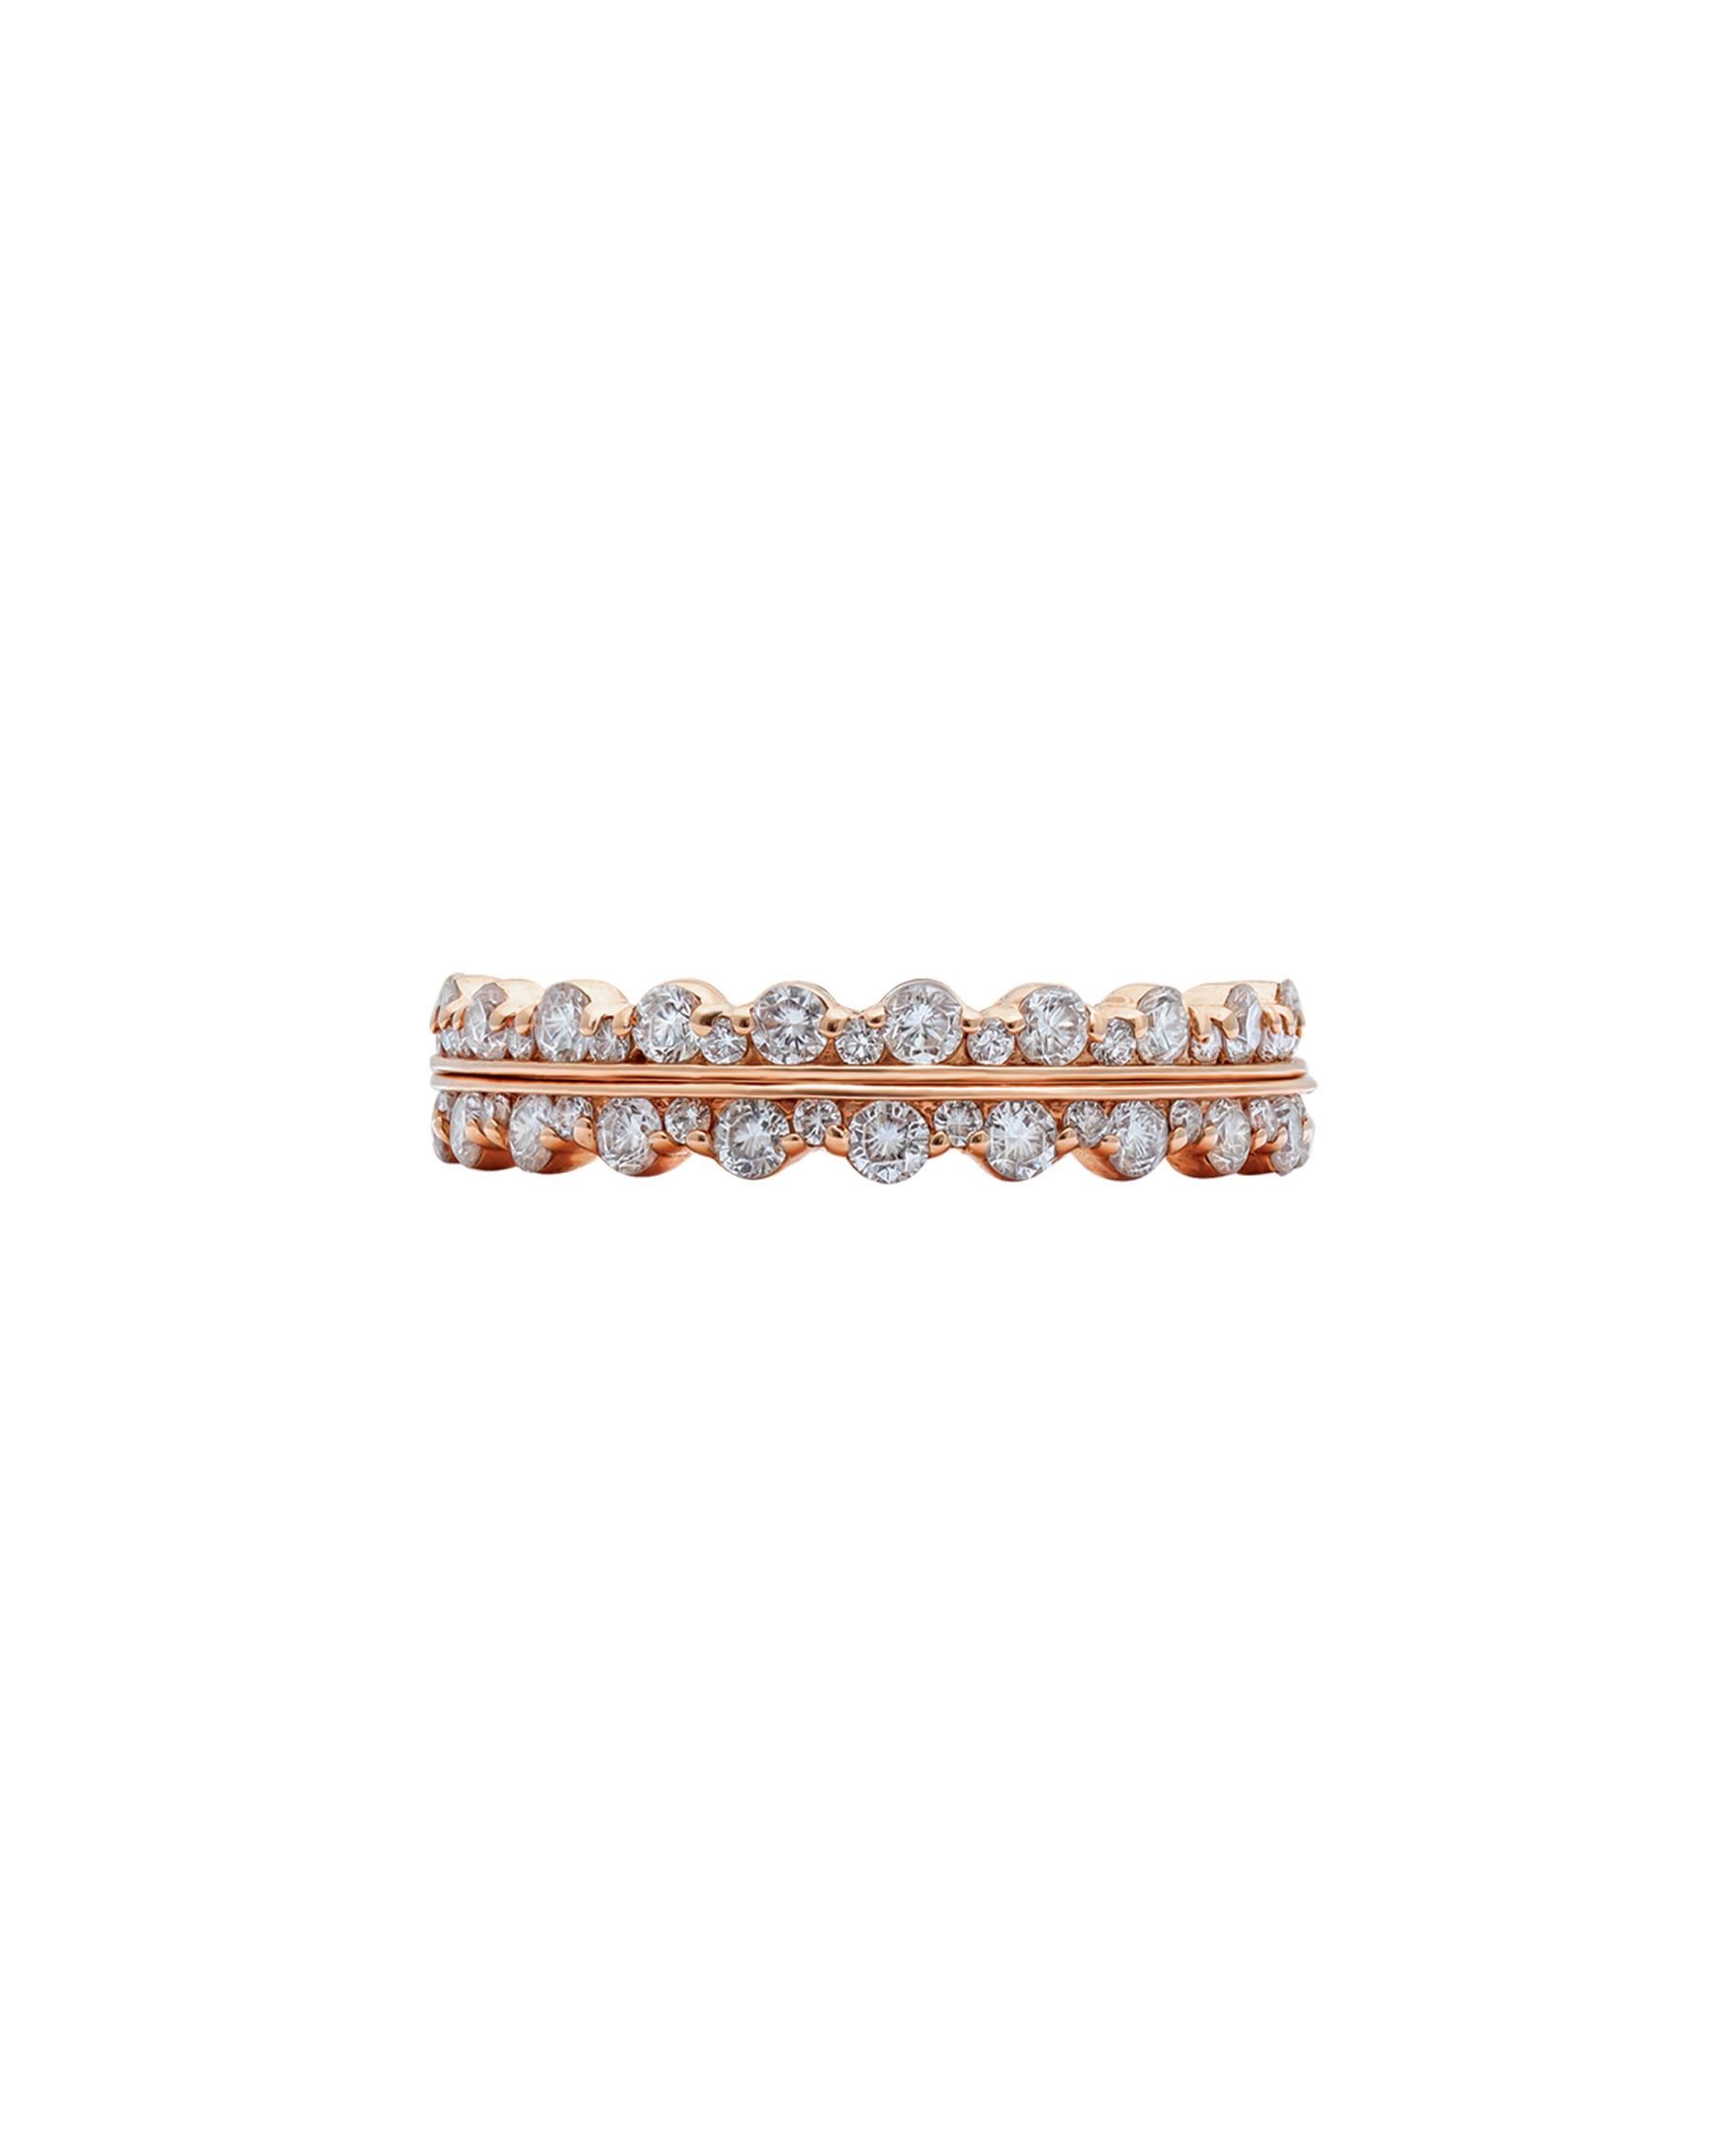 designer diamond bridal jewelry-1-2.jpg